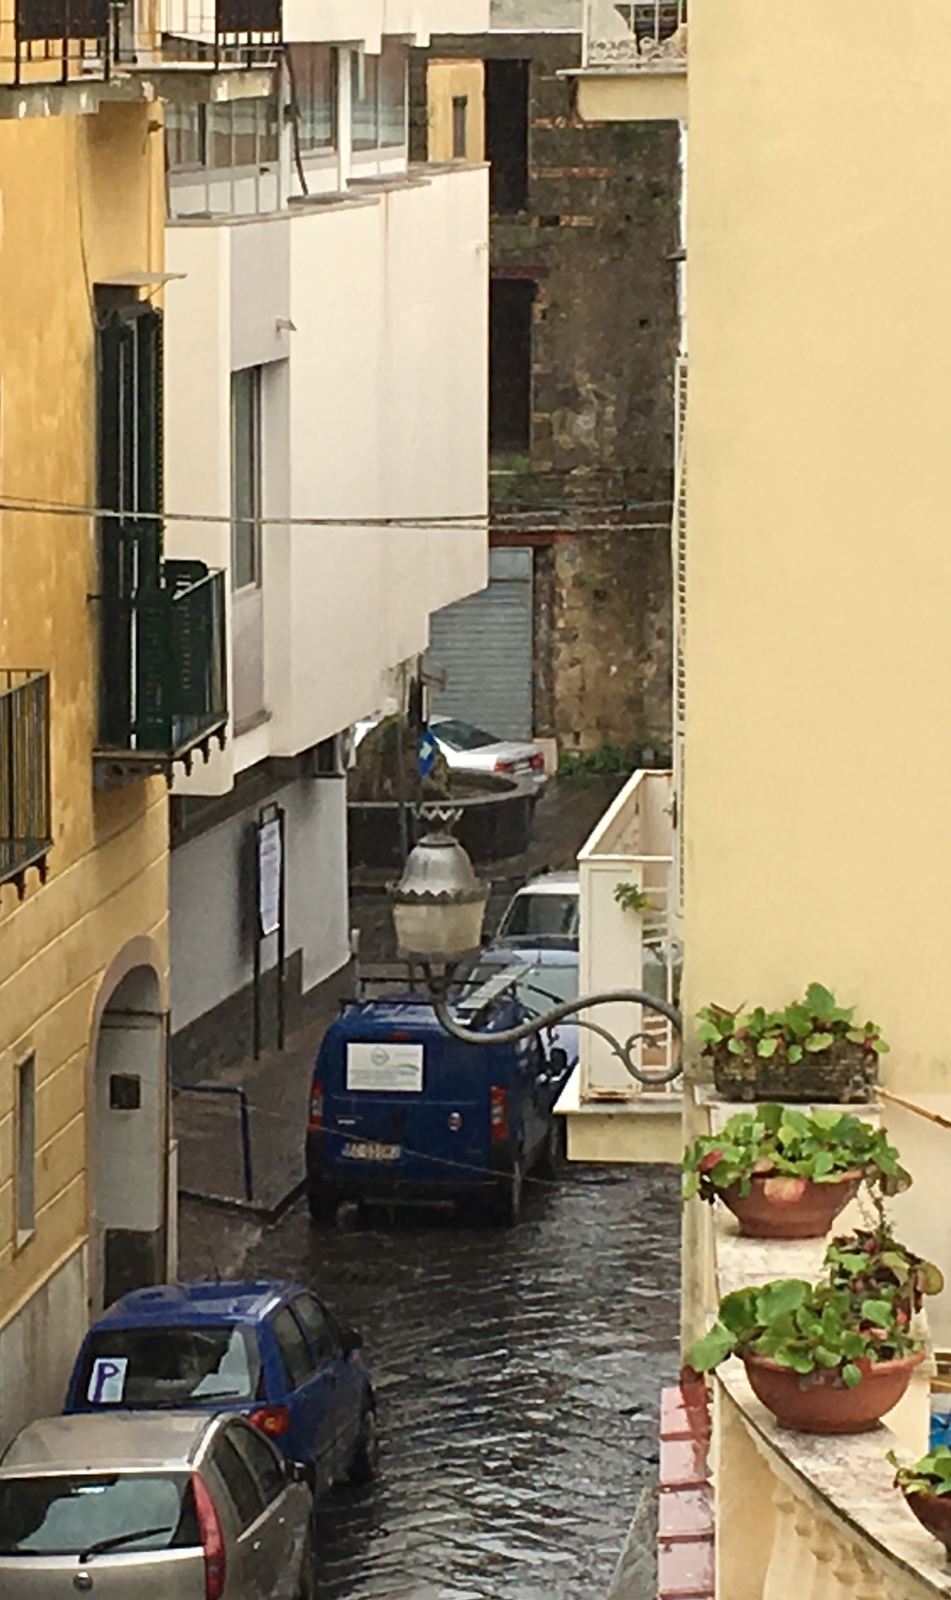 Via siano a Sant'Anastasia (Napoli)